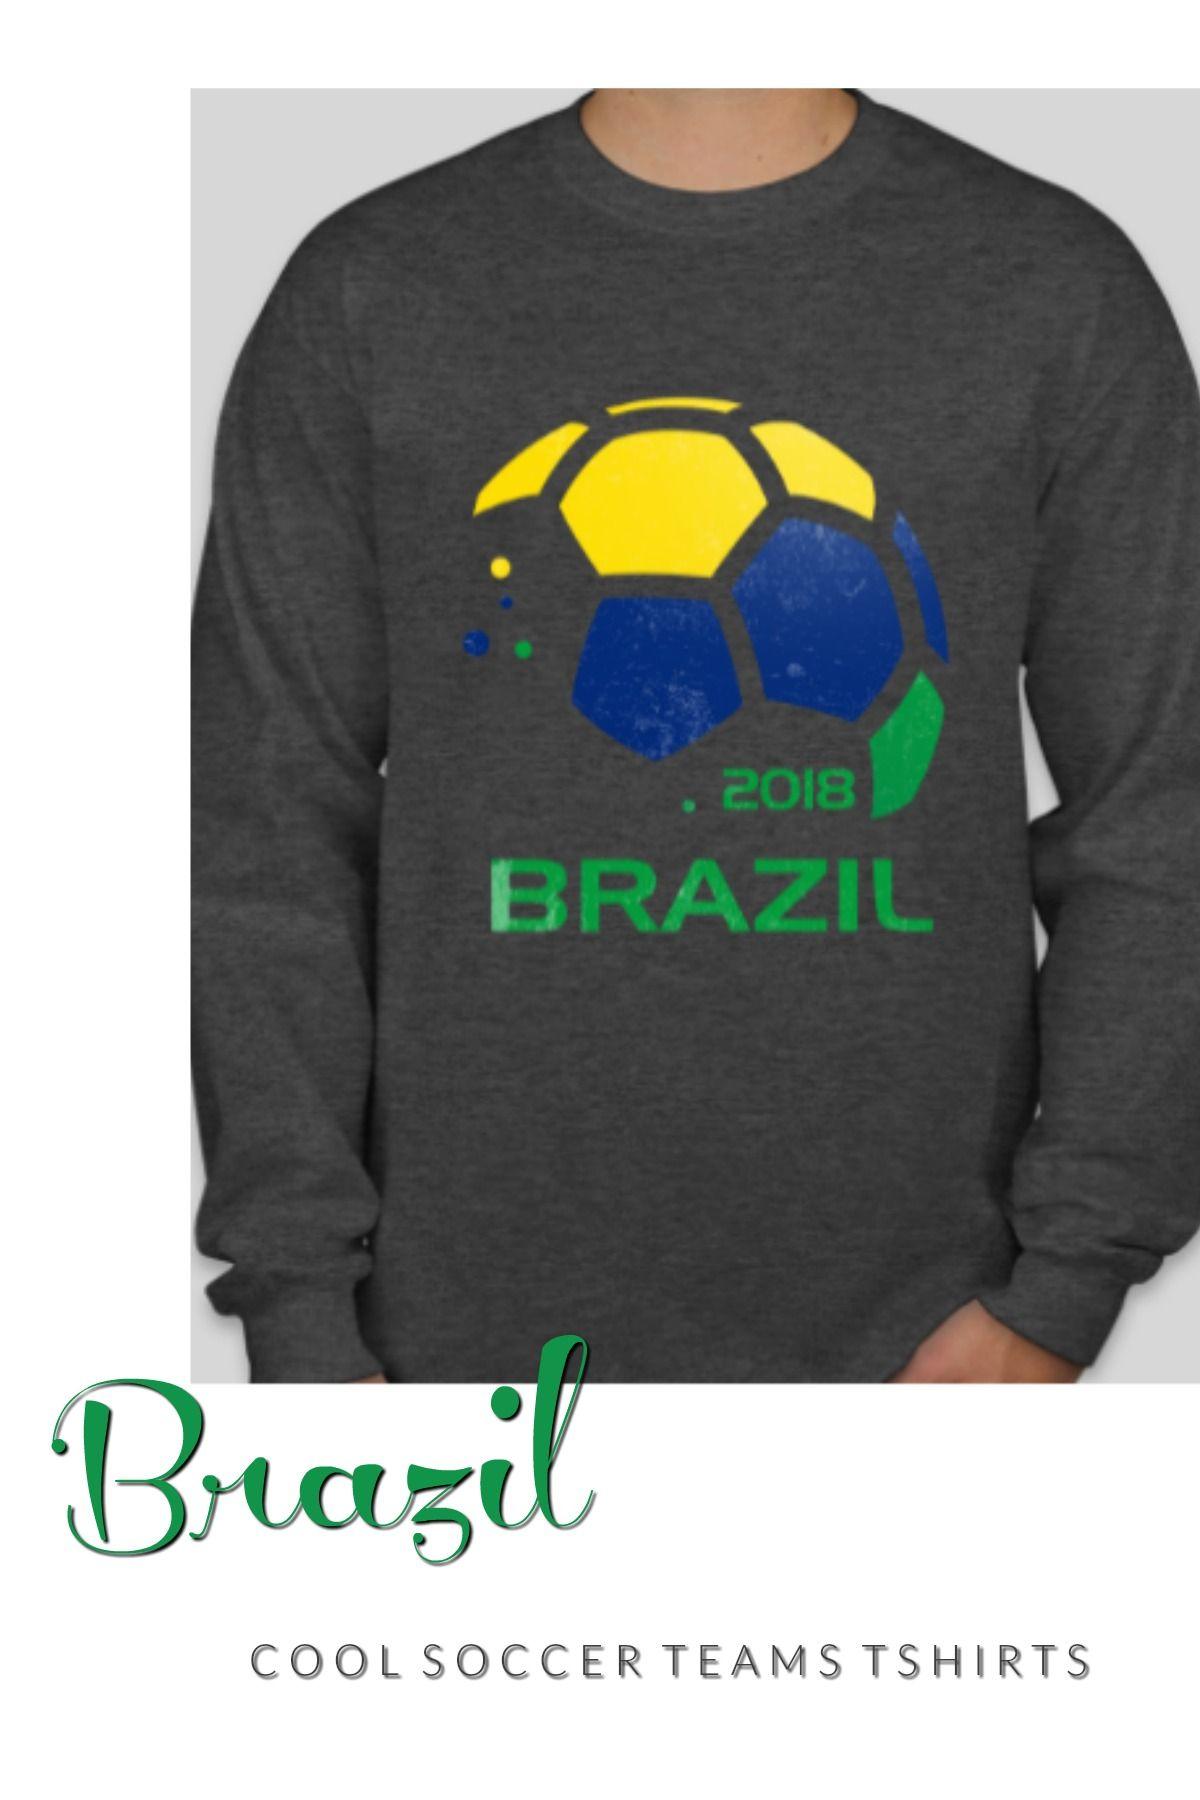 6eb63de46 Brazil Soccer T Shirt - Futbol Fan Clothing. Cool Soccer Teams T Shirts.